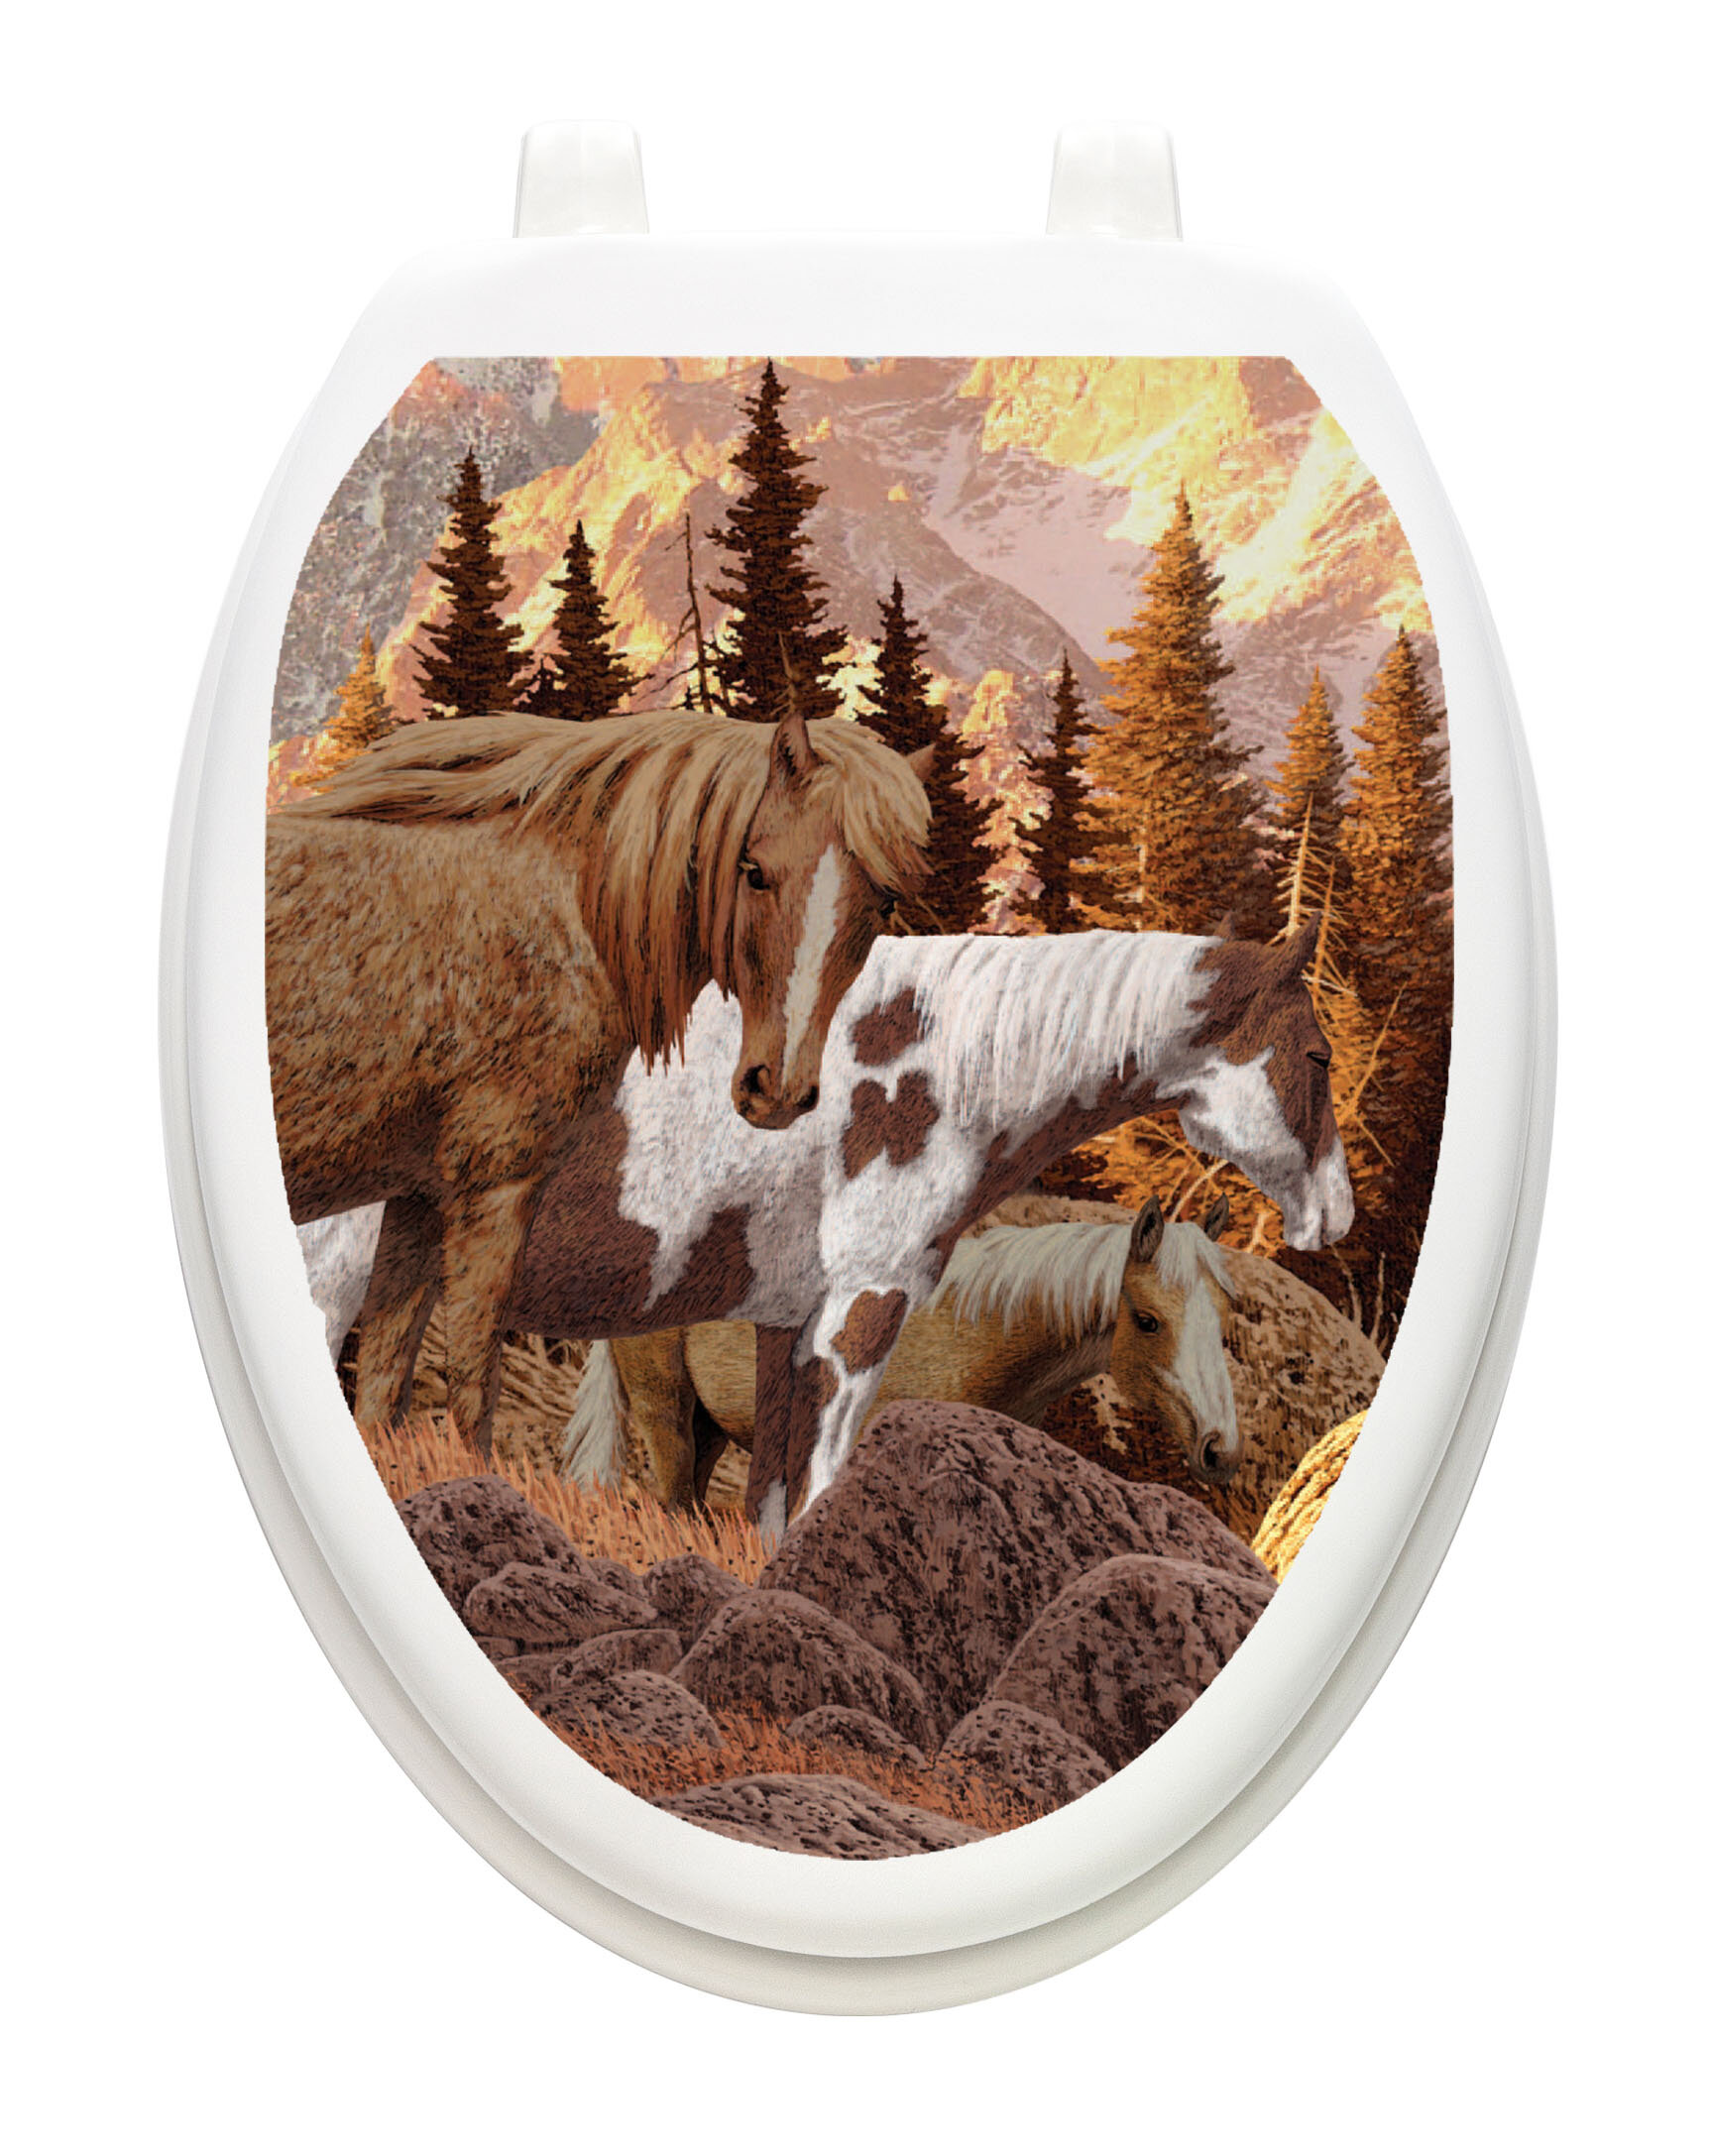 Toilet Tattoos Toilet Lid Cover  Decor Painted Horse Reusable  Vinyl